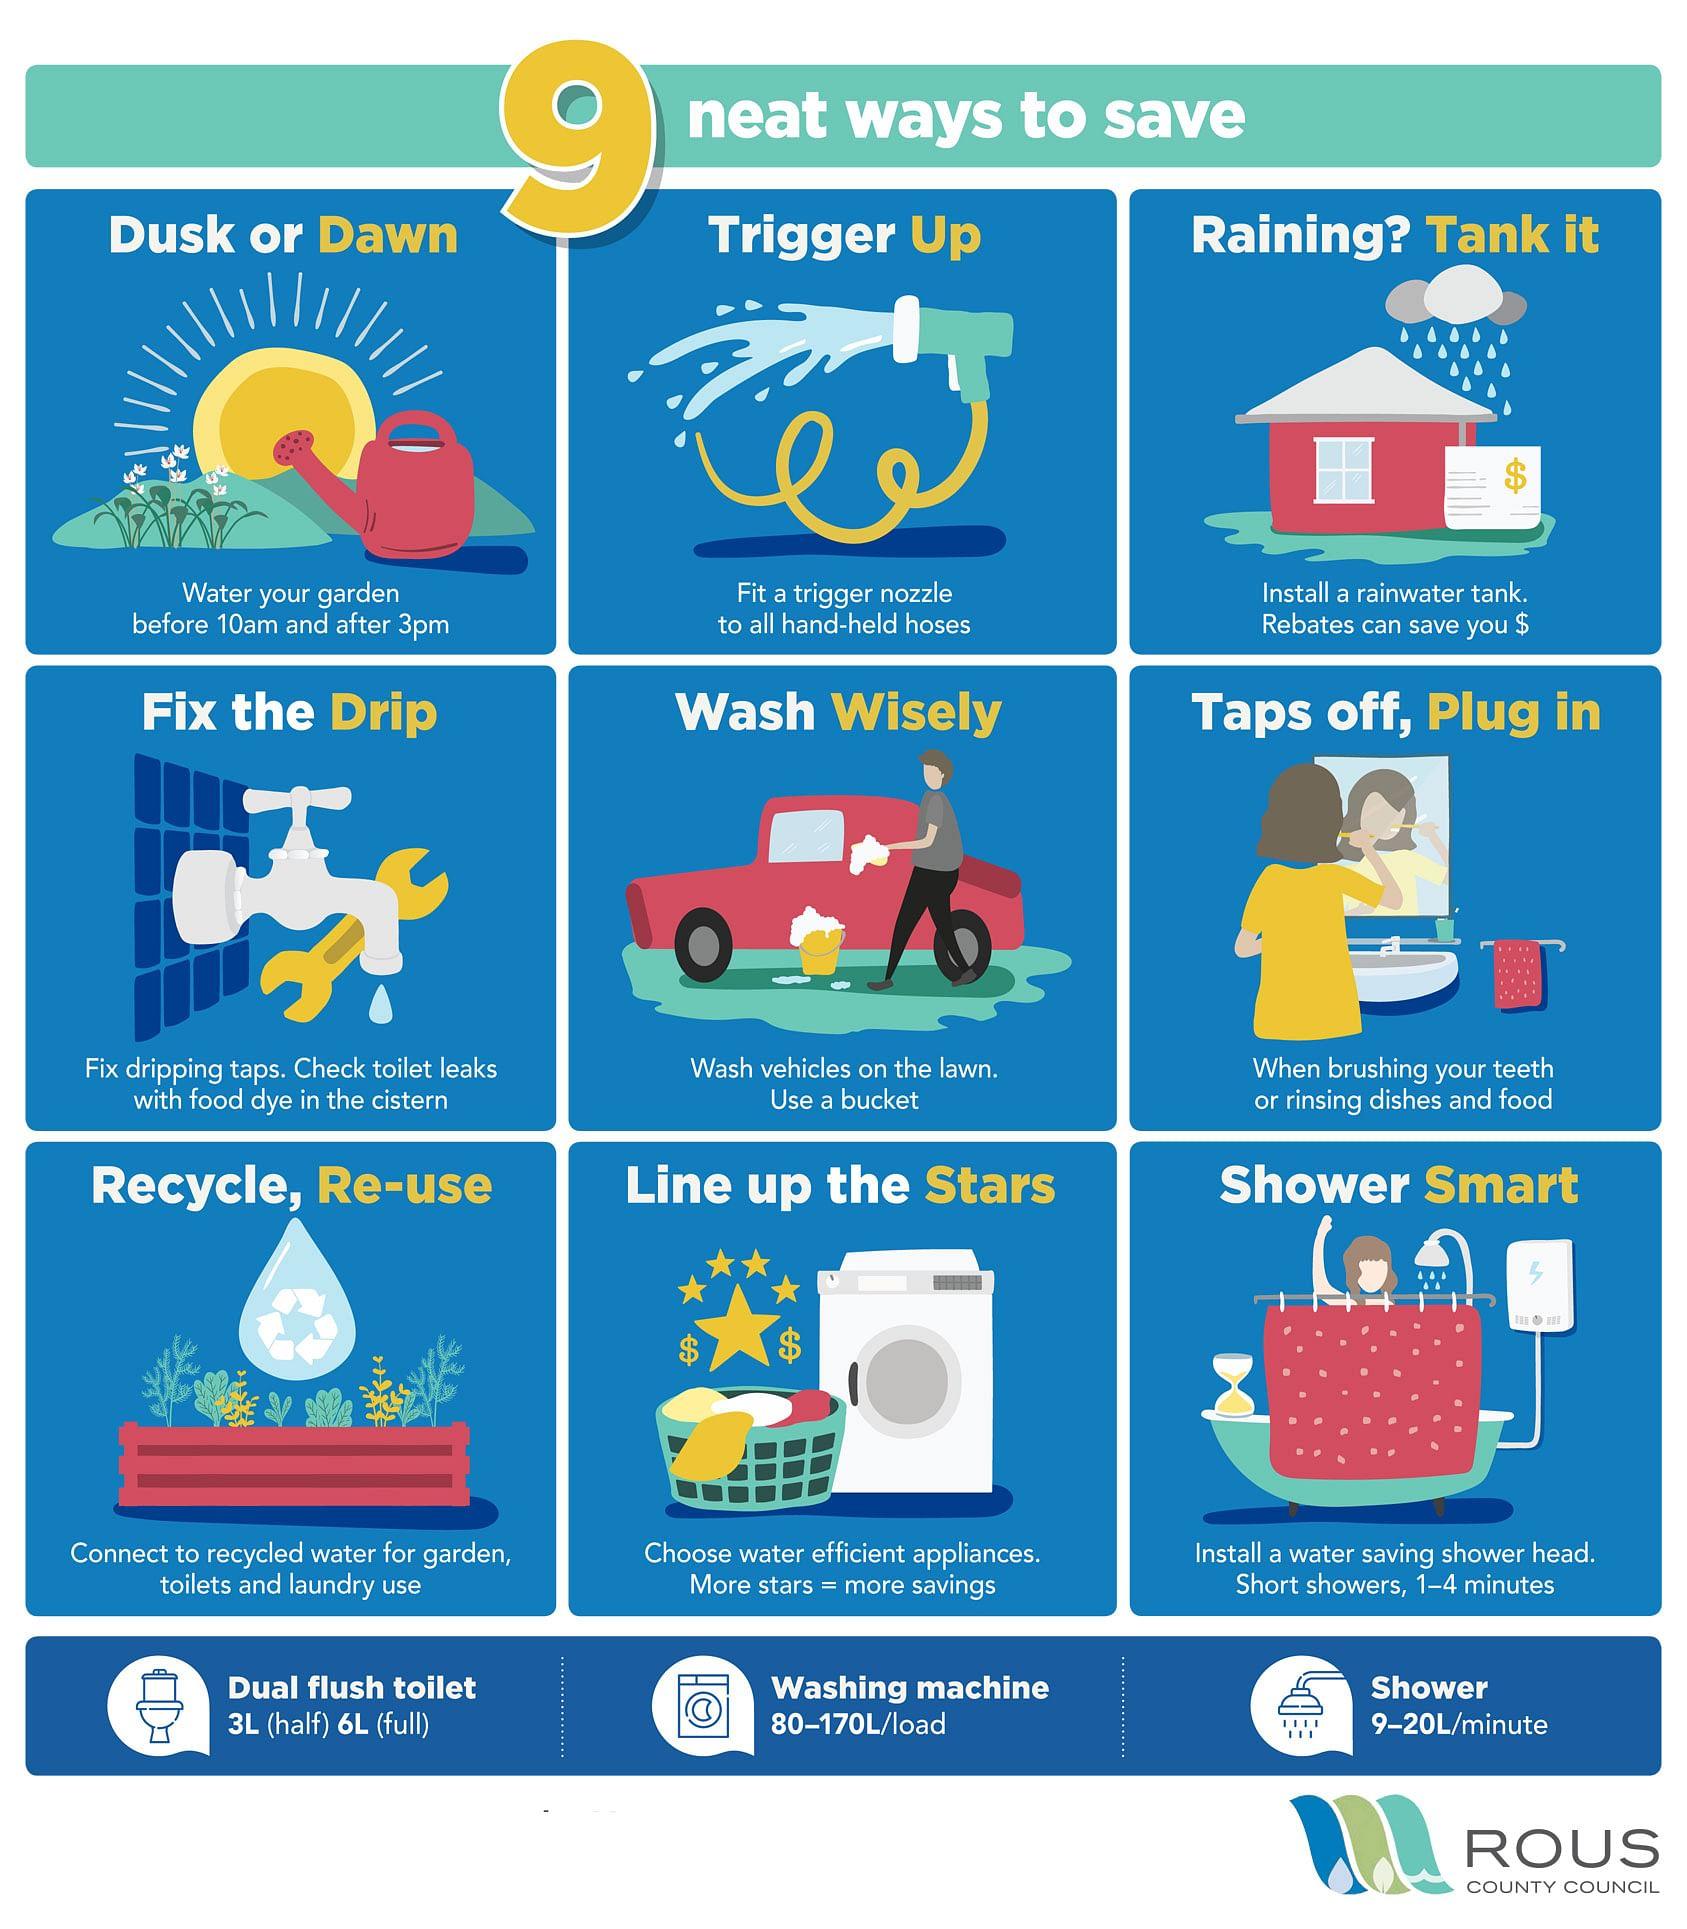 Nine neat ways to save water